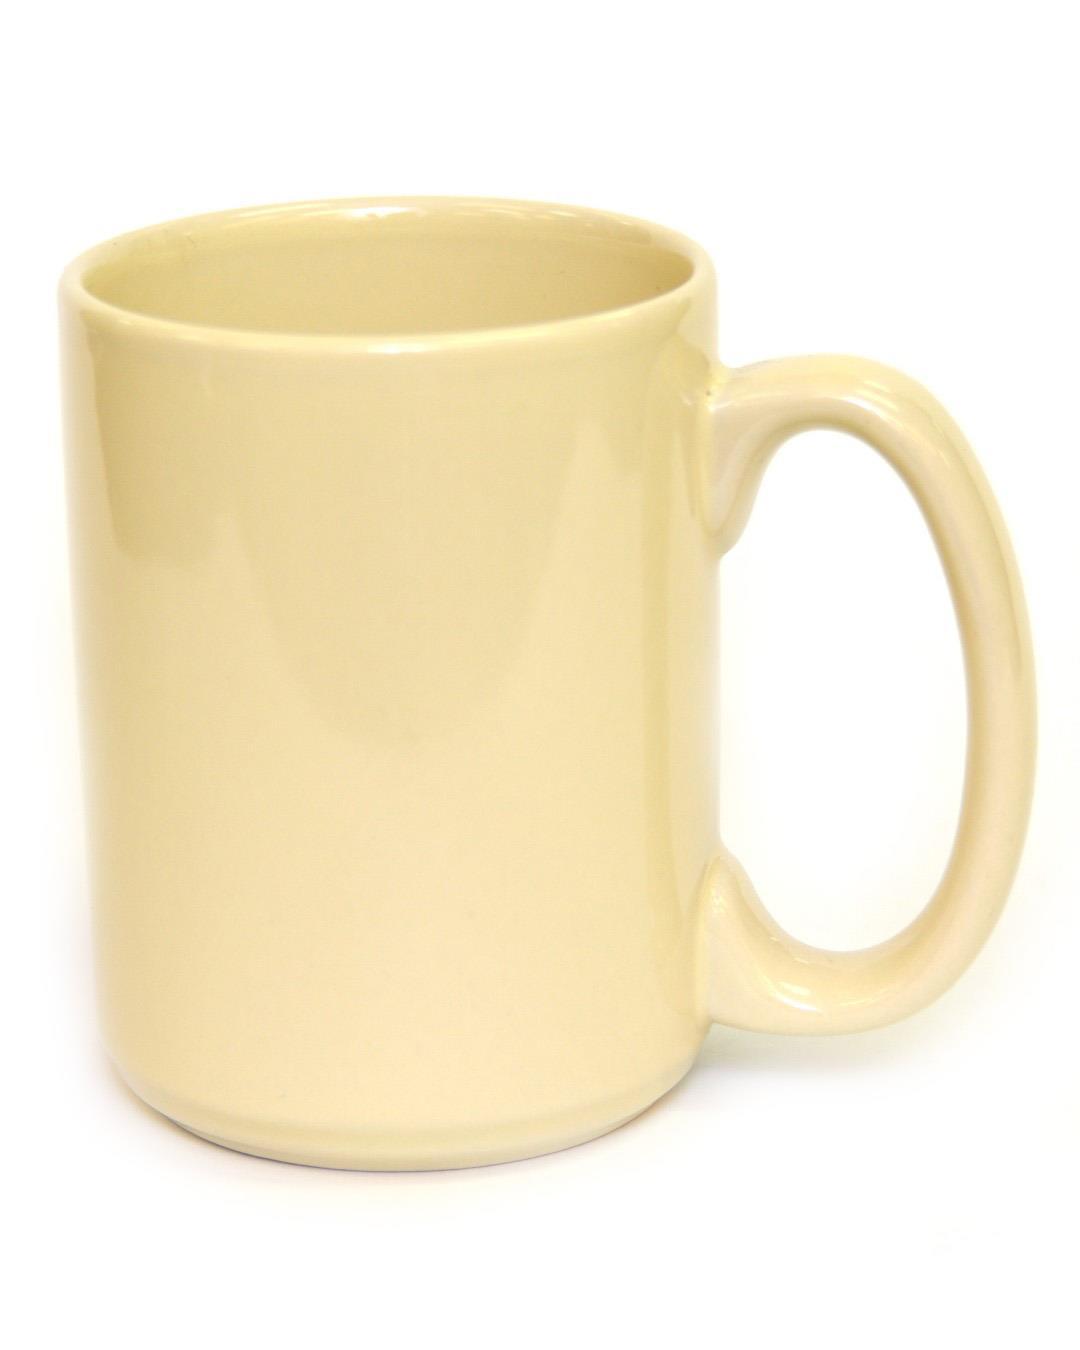 15 Ounce Coffee Mug Almond